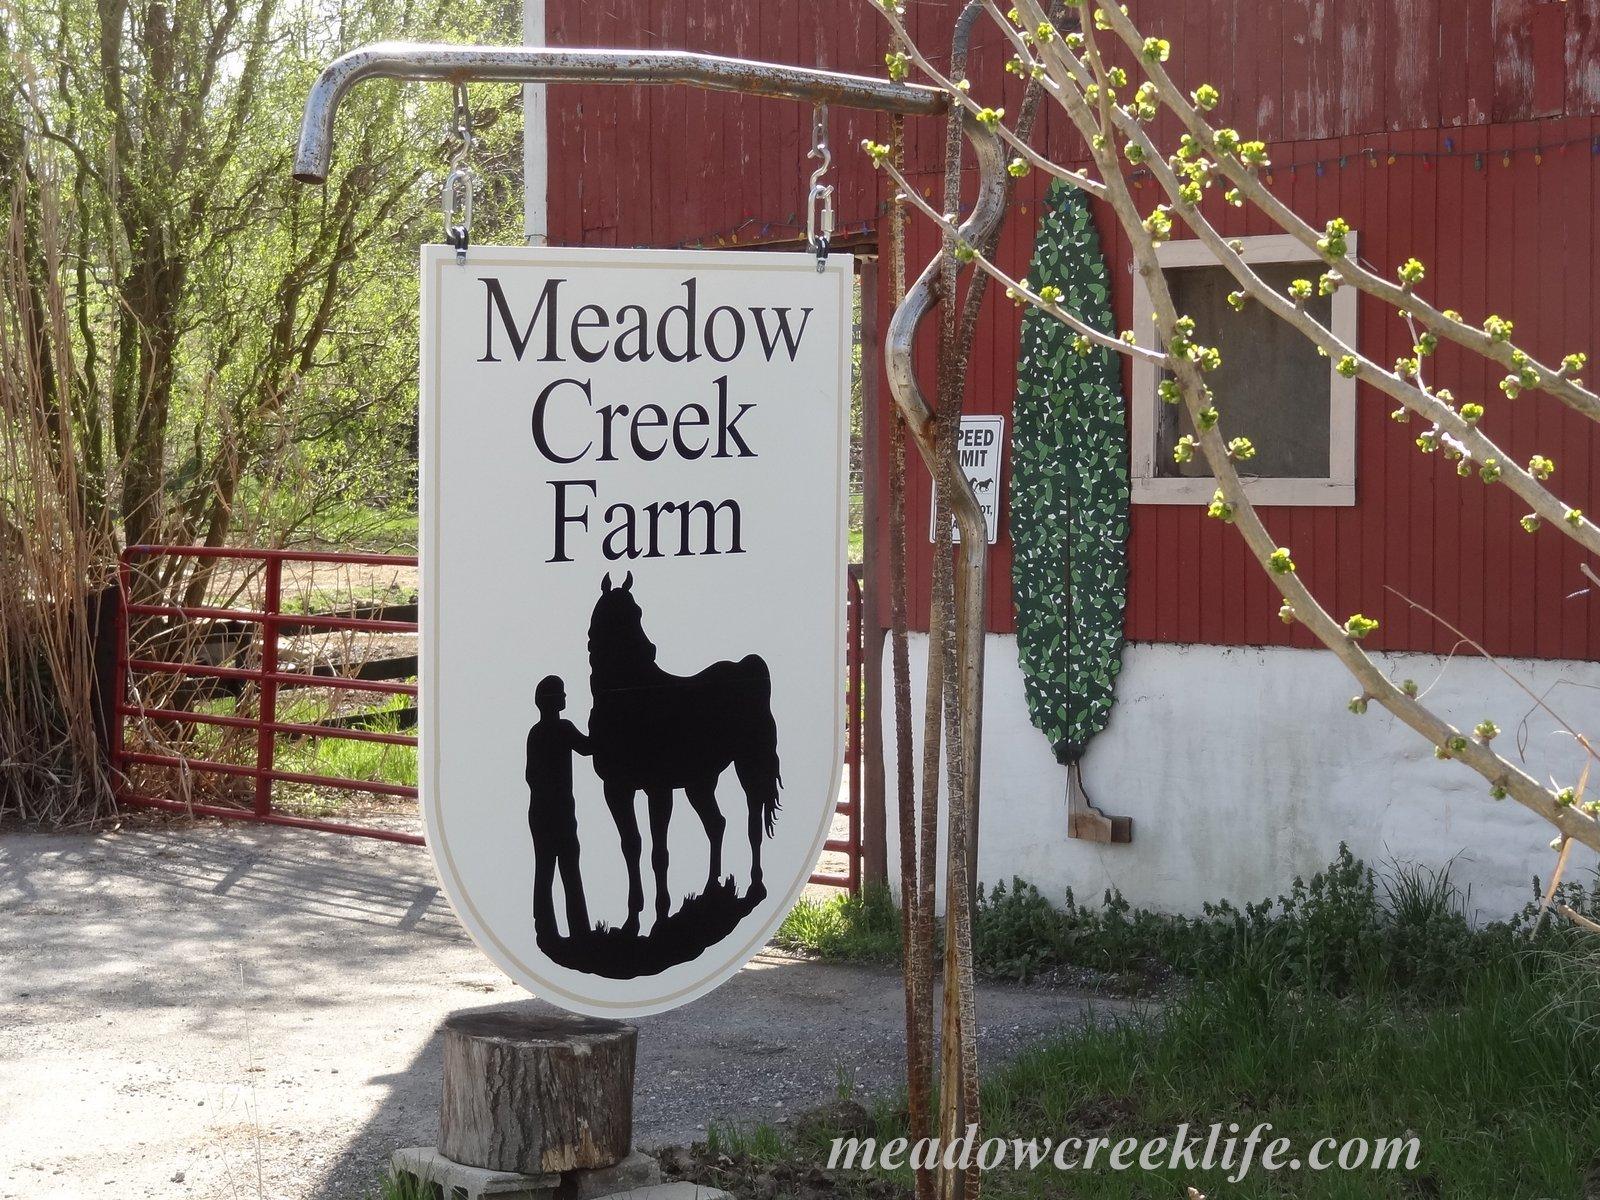 Meadow Creek Farm A New Sign For Meadow Creek Farm Part 2